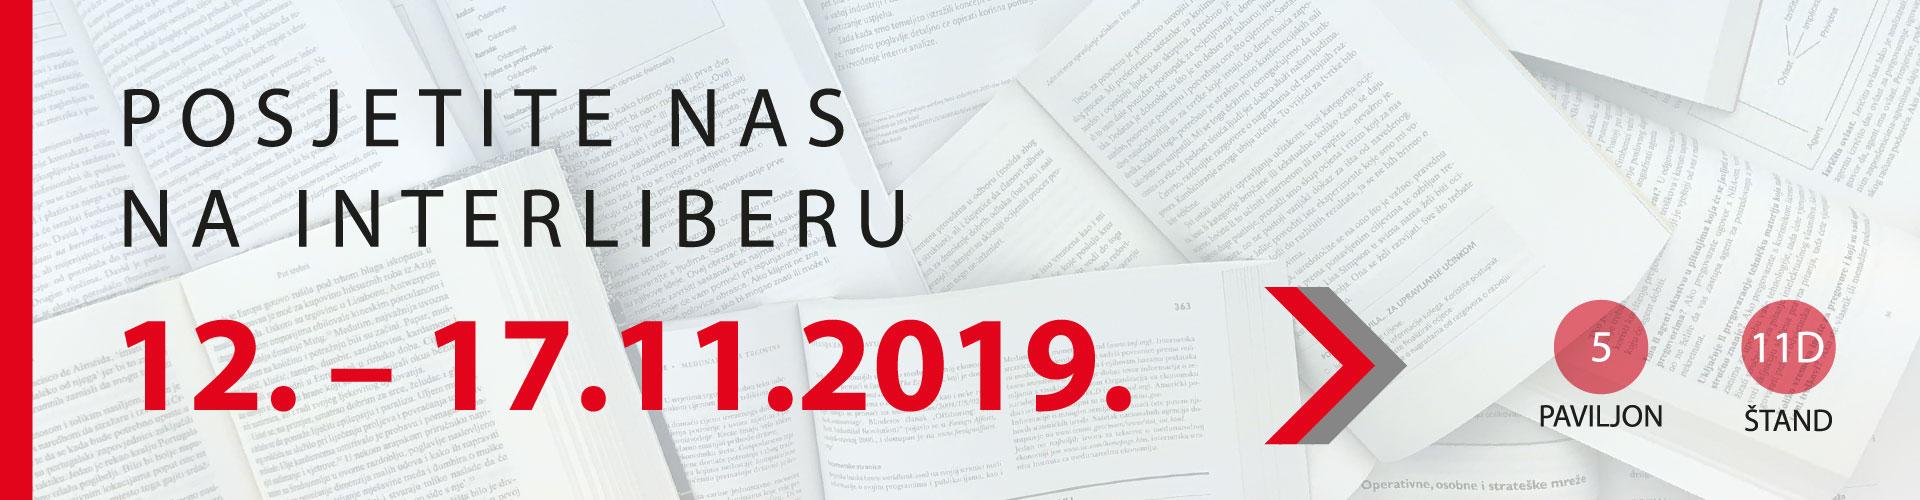 Interliber 2019